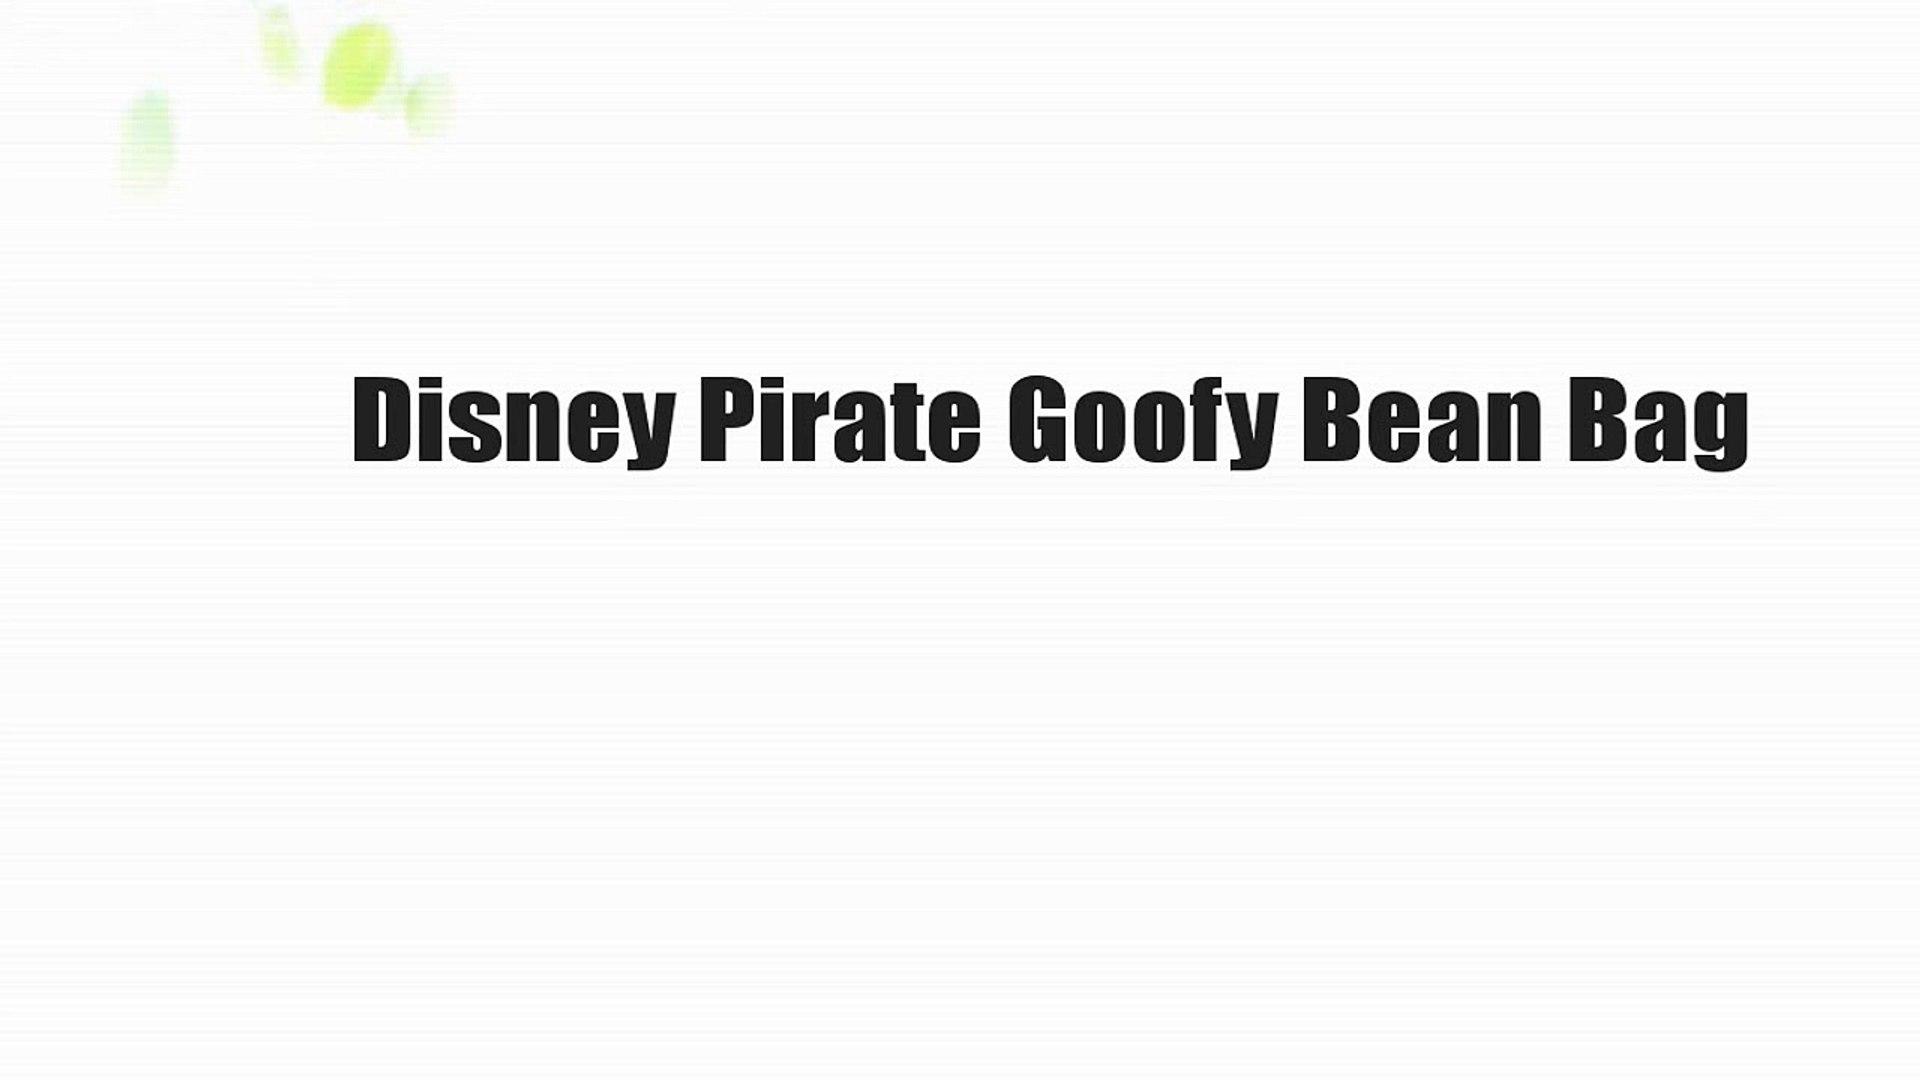 Outstanding Disney Pirate Goofy Bean Bag Machost Co Dining Chair Design Ideas Machostcouk